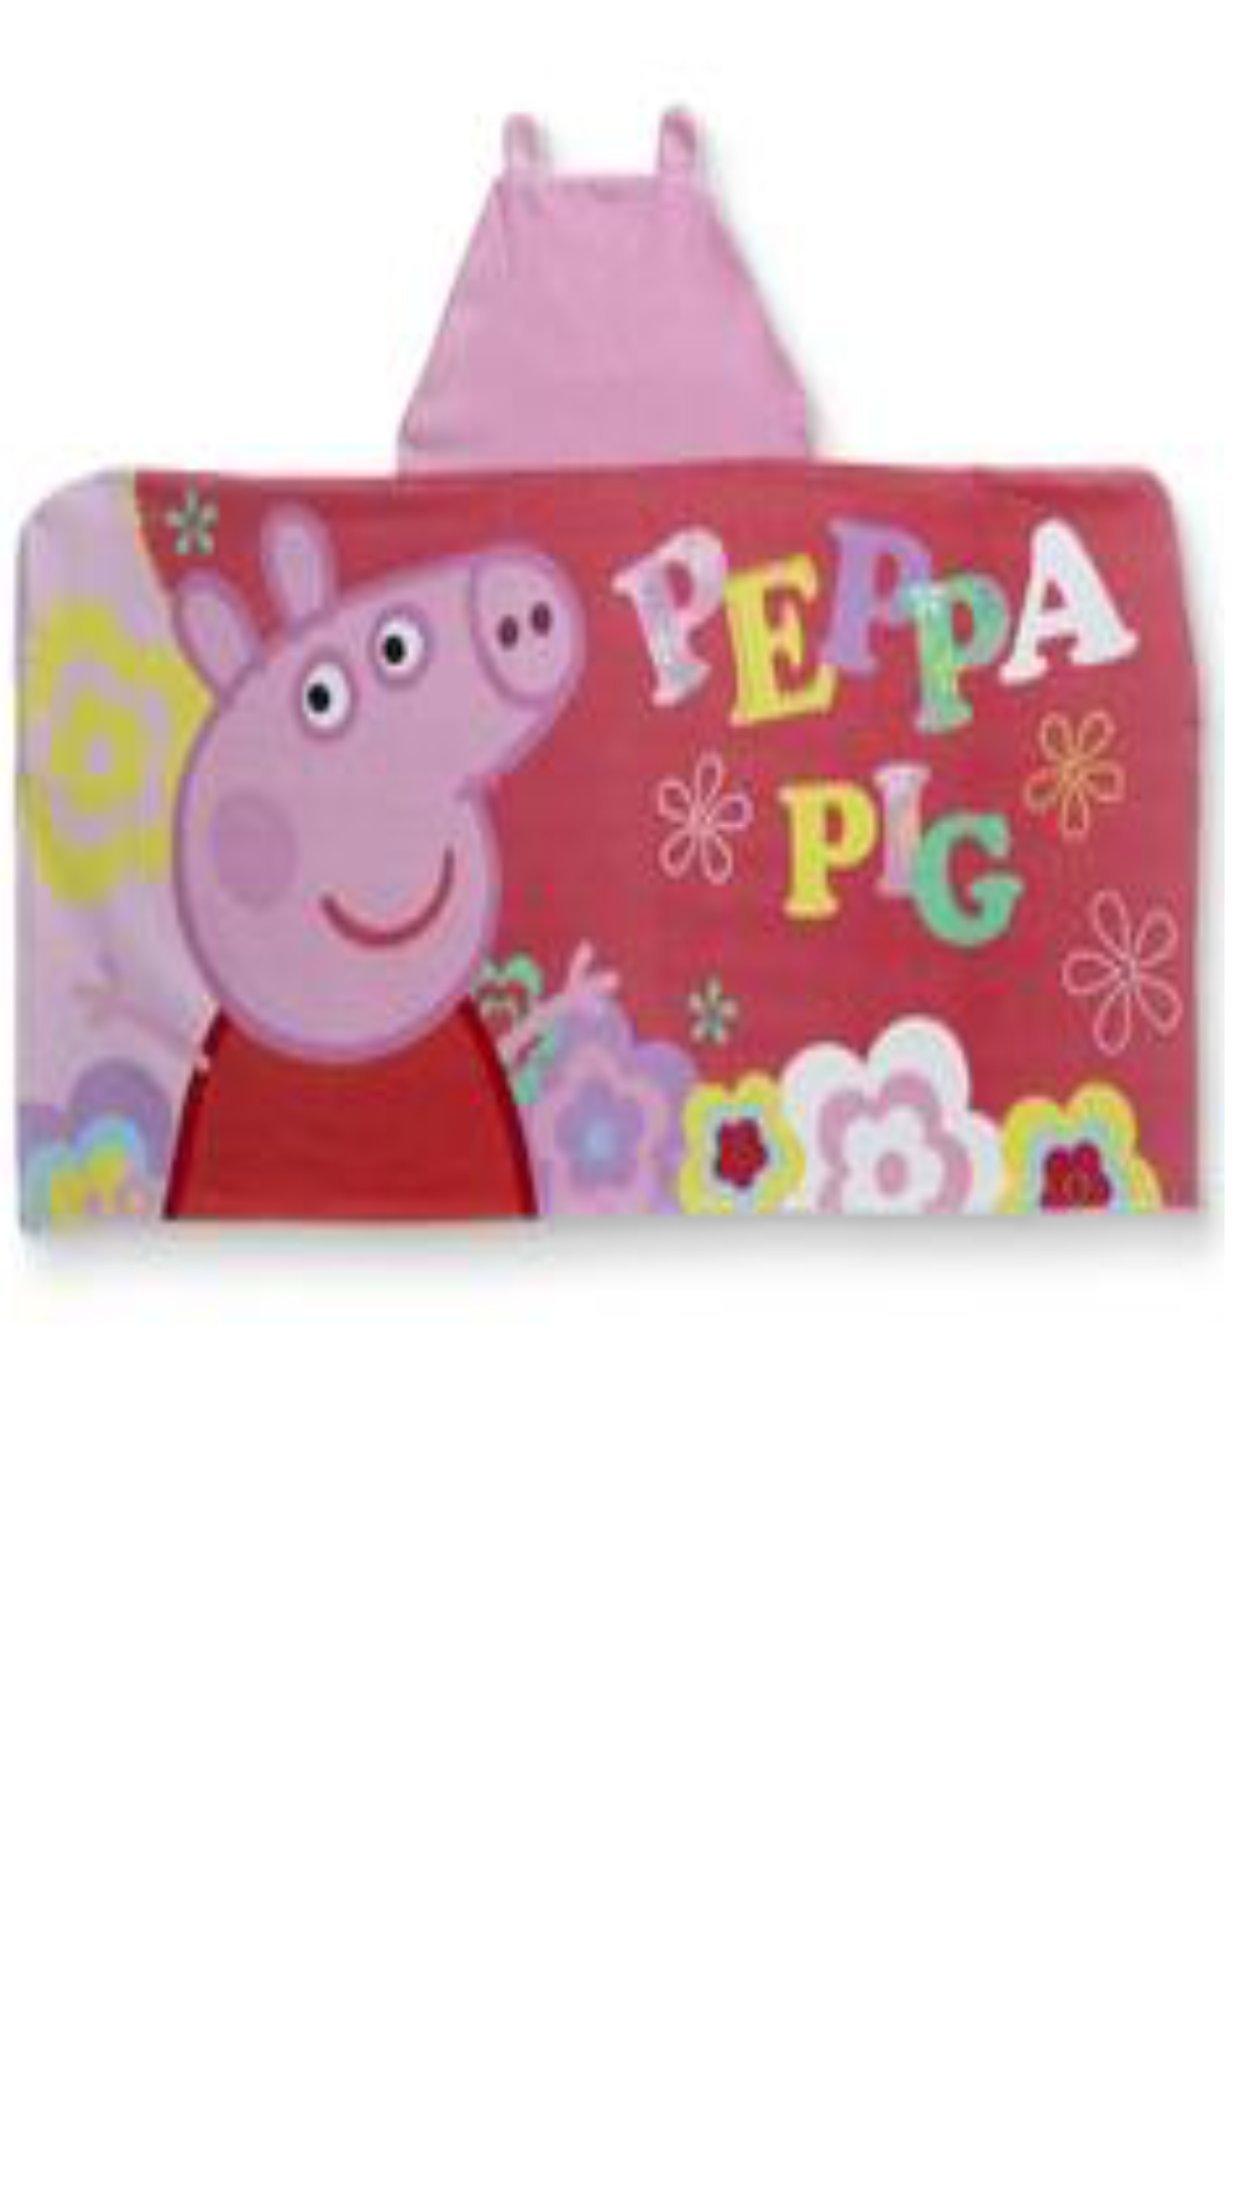 Peppa Pig Hooded Towel for Bath, Shower, Pool, Beach